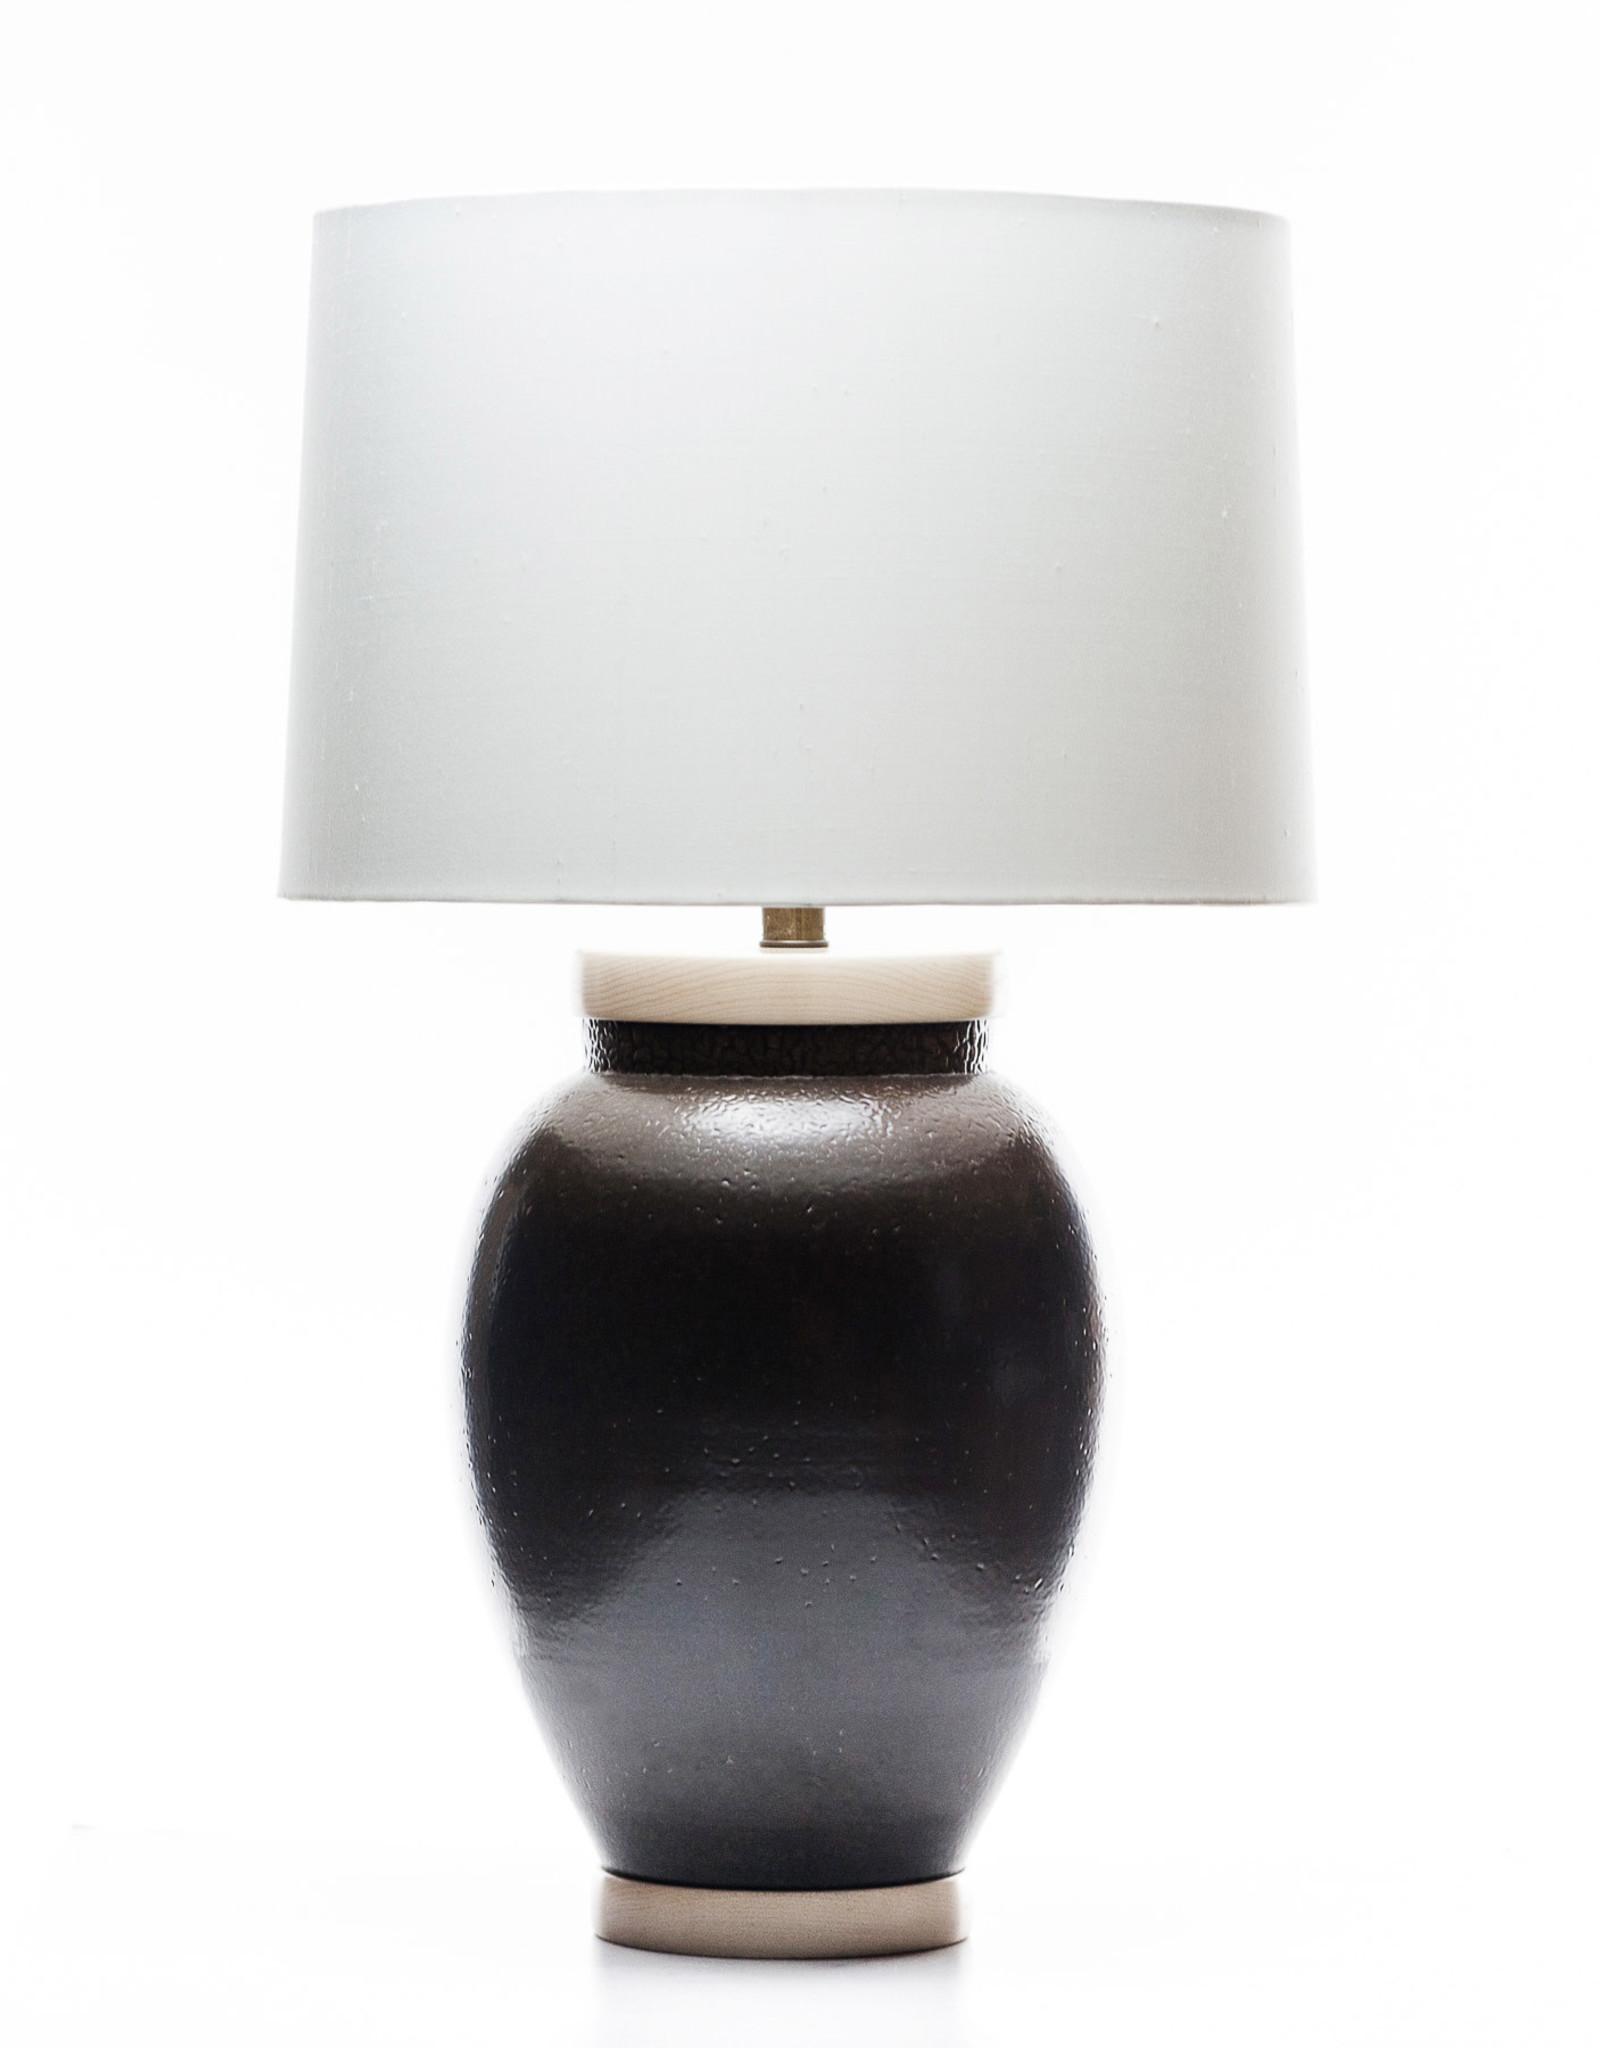 Lawrence & Scott Sybil Porcelain Table Lamp